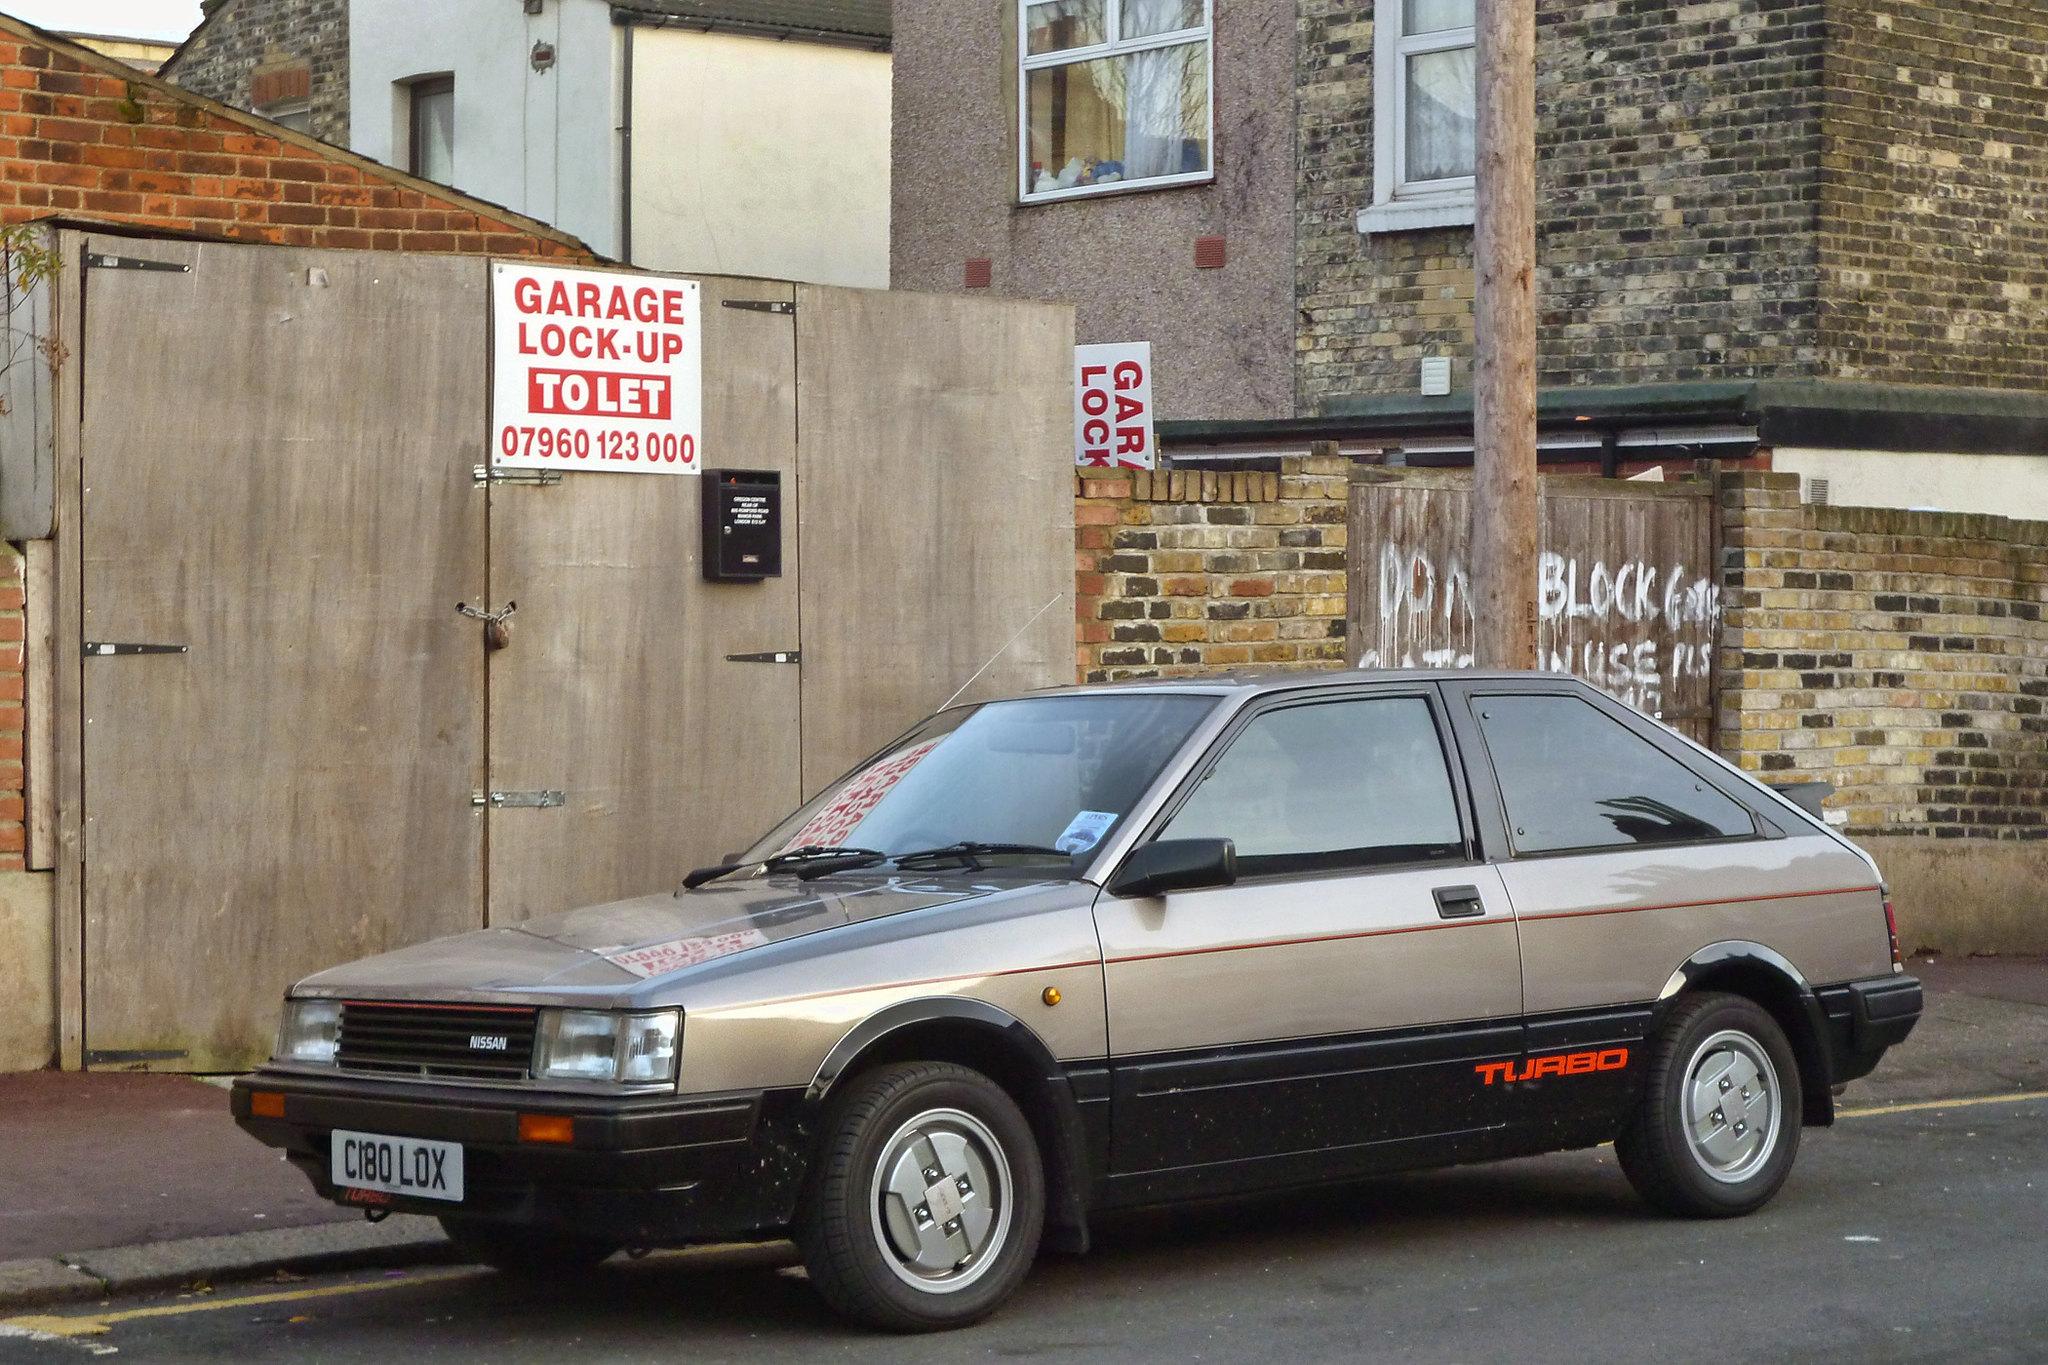 1986 Nissan Cherry Turbo (N12) Hatchback